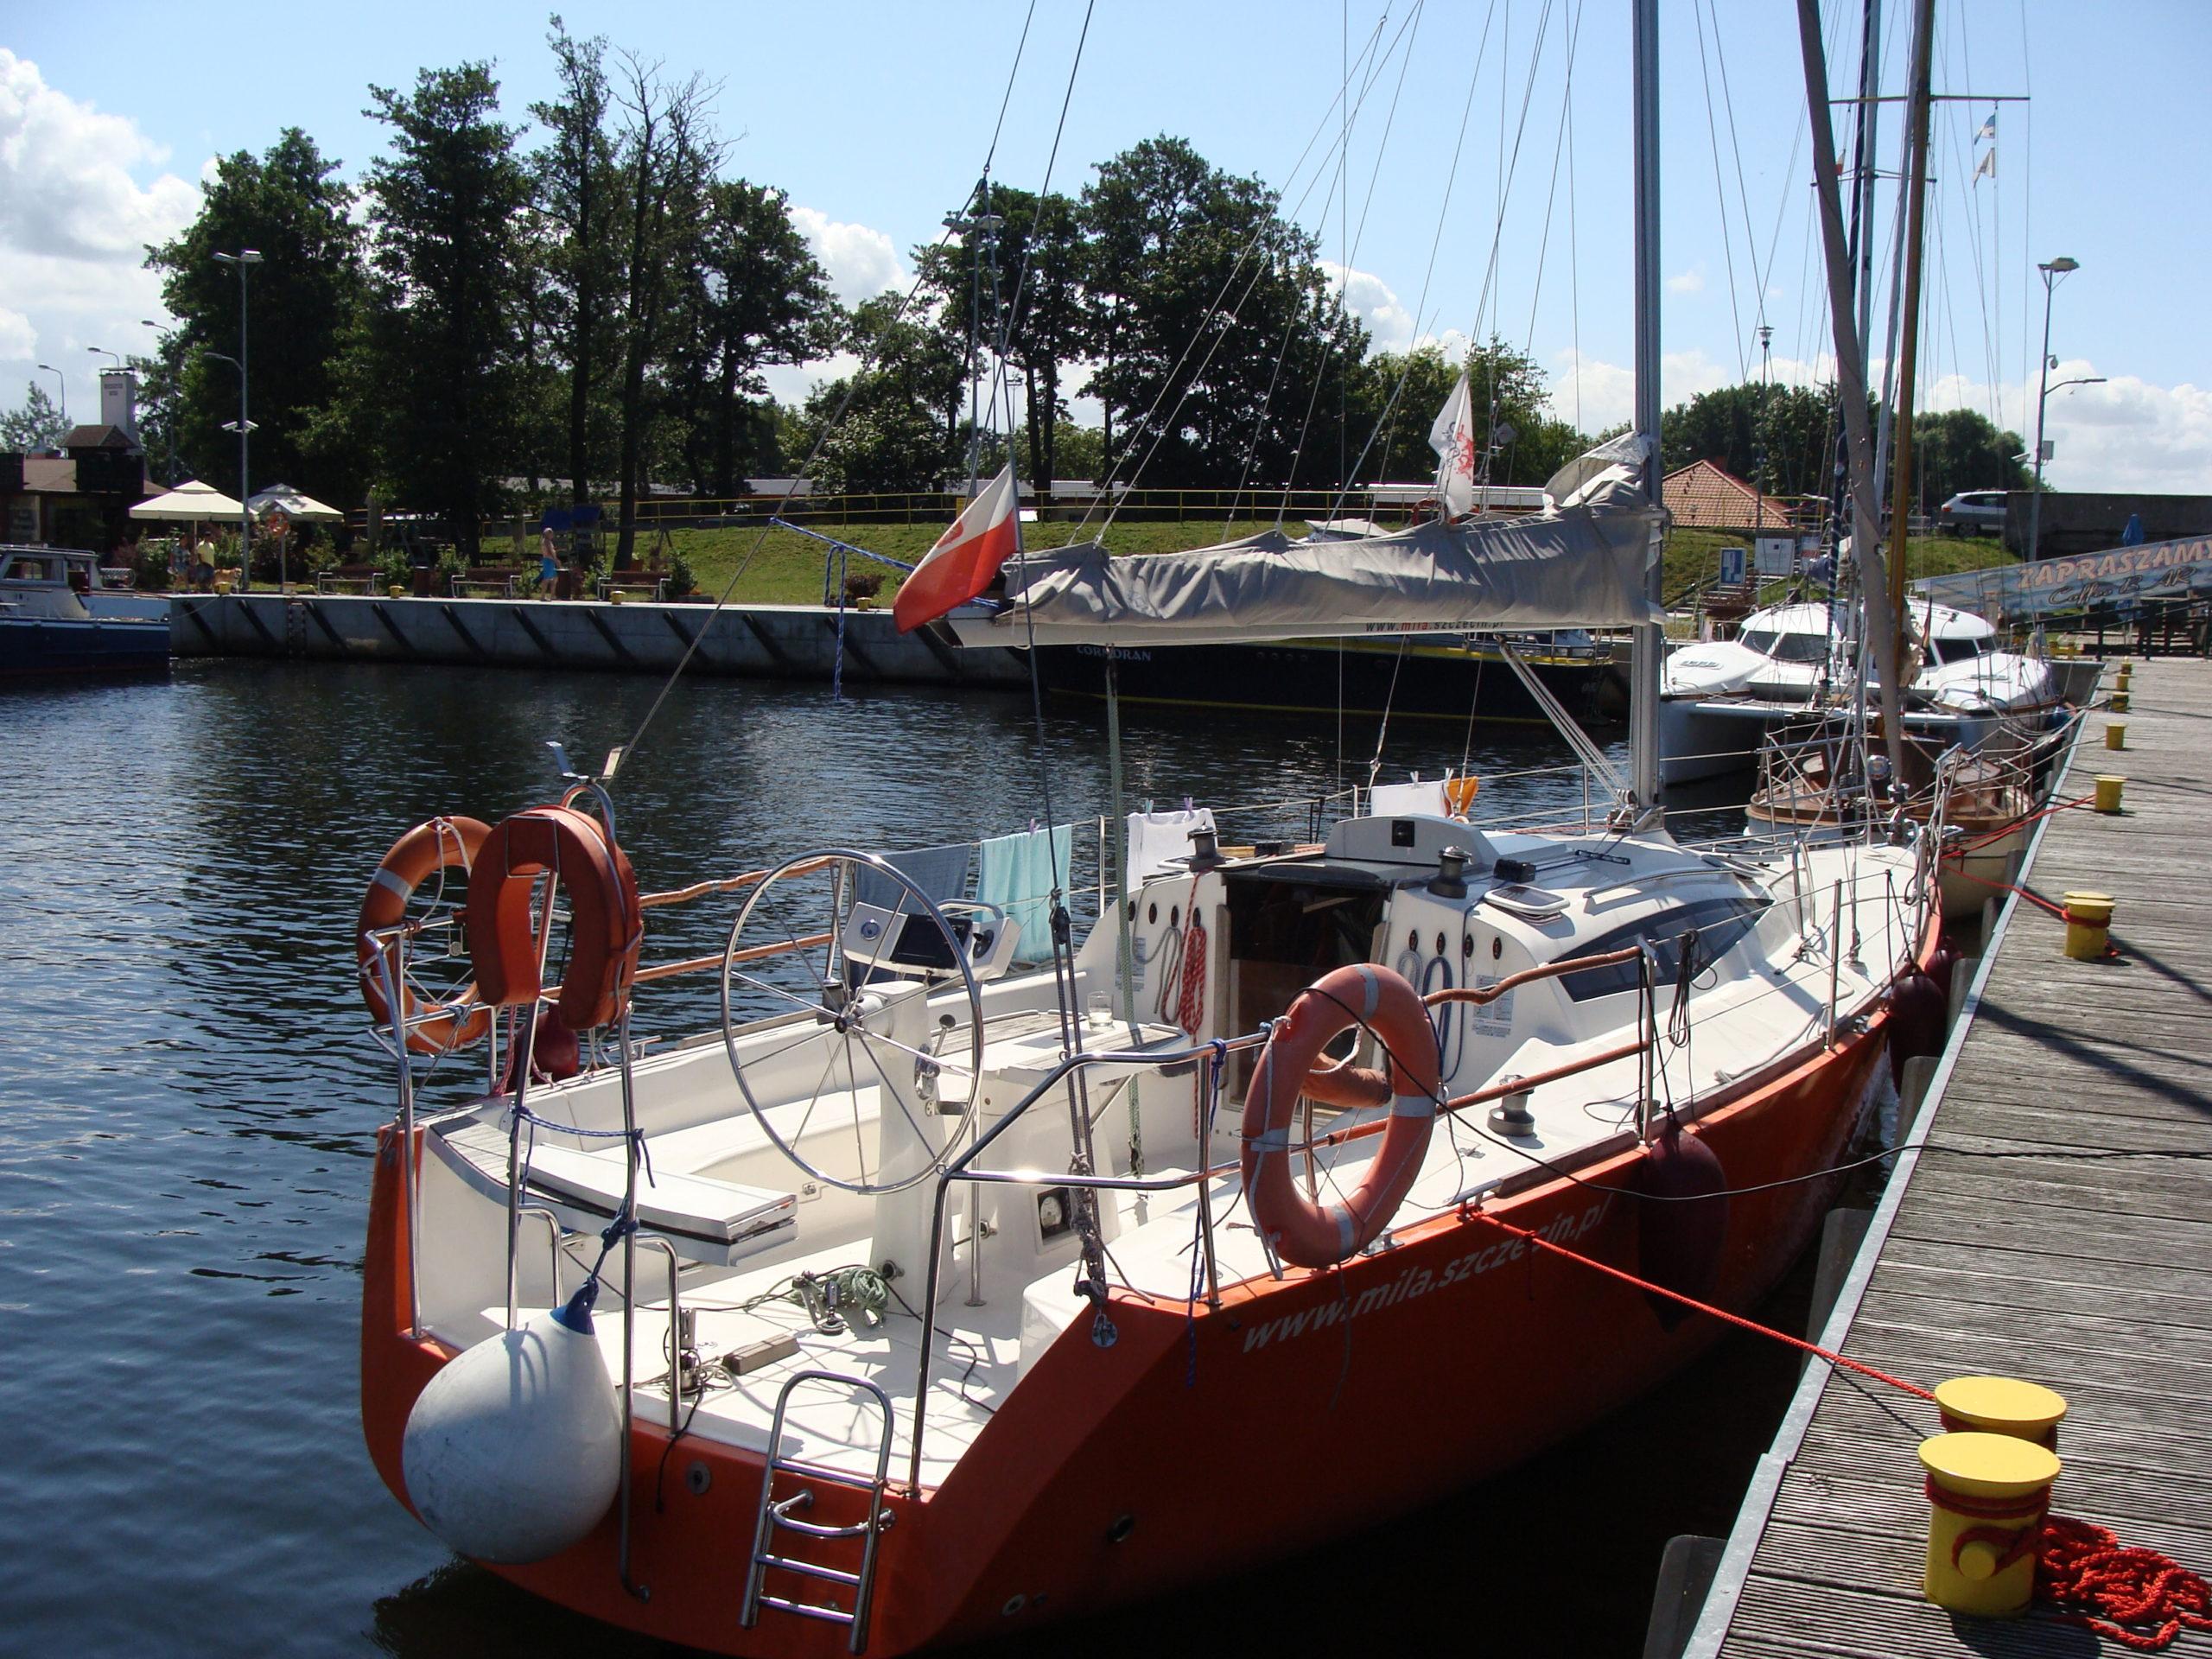 Jacht morski 8